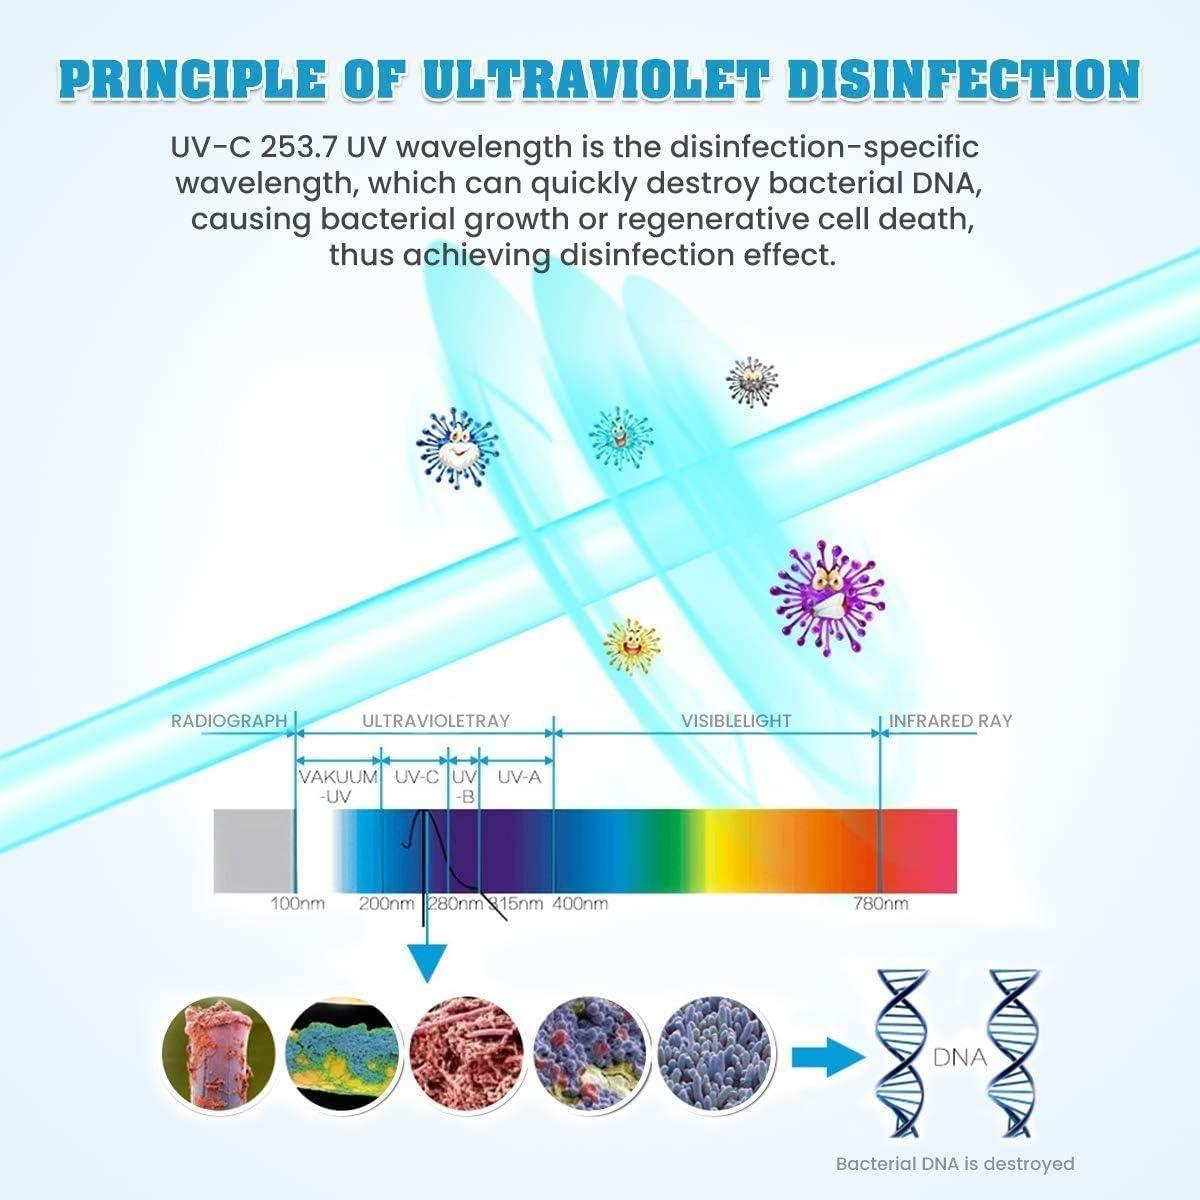 Relojes UVA Caja Desinfectante Port/átil Purificador de Aire Limpiadora Mata Bacterias para Mascarillas MECO Esterilizador UV de Tel/éfono M/óvil con 3 Luces Ultravioletas Desinfecci/ón UVC Llaves